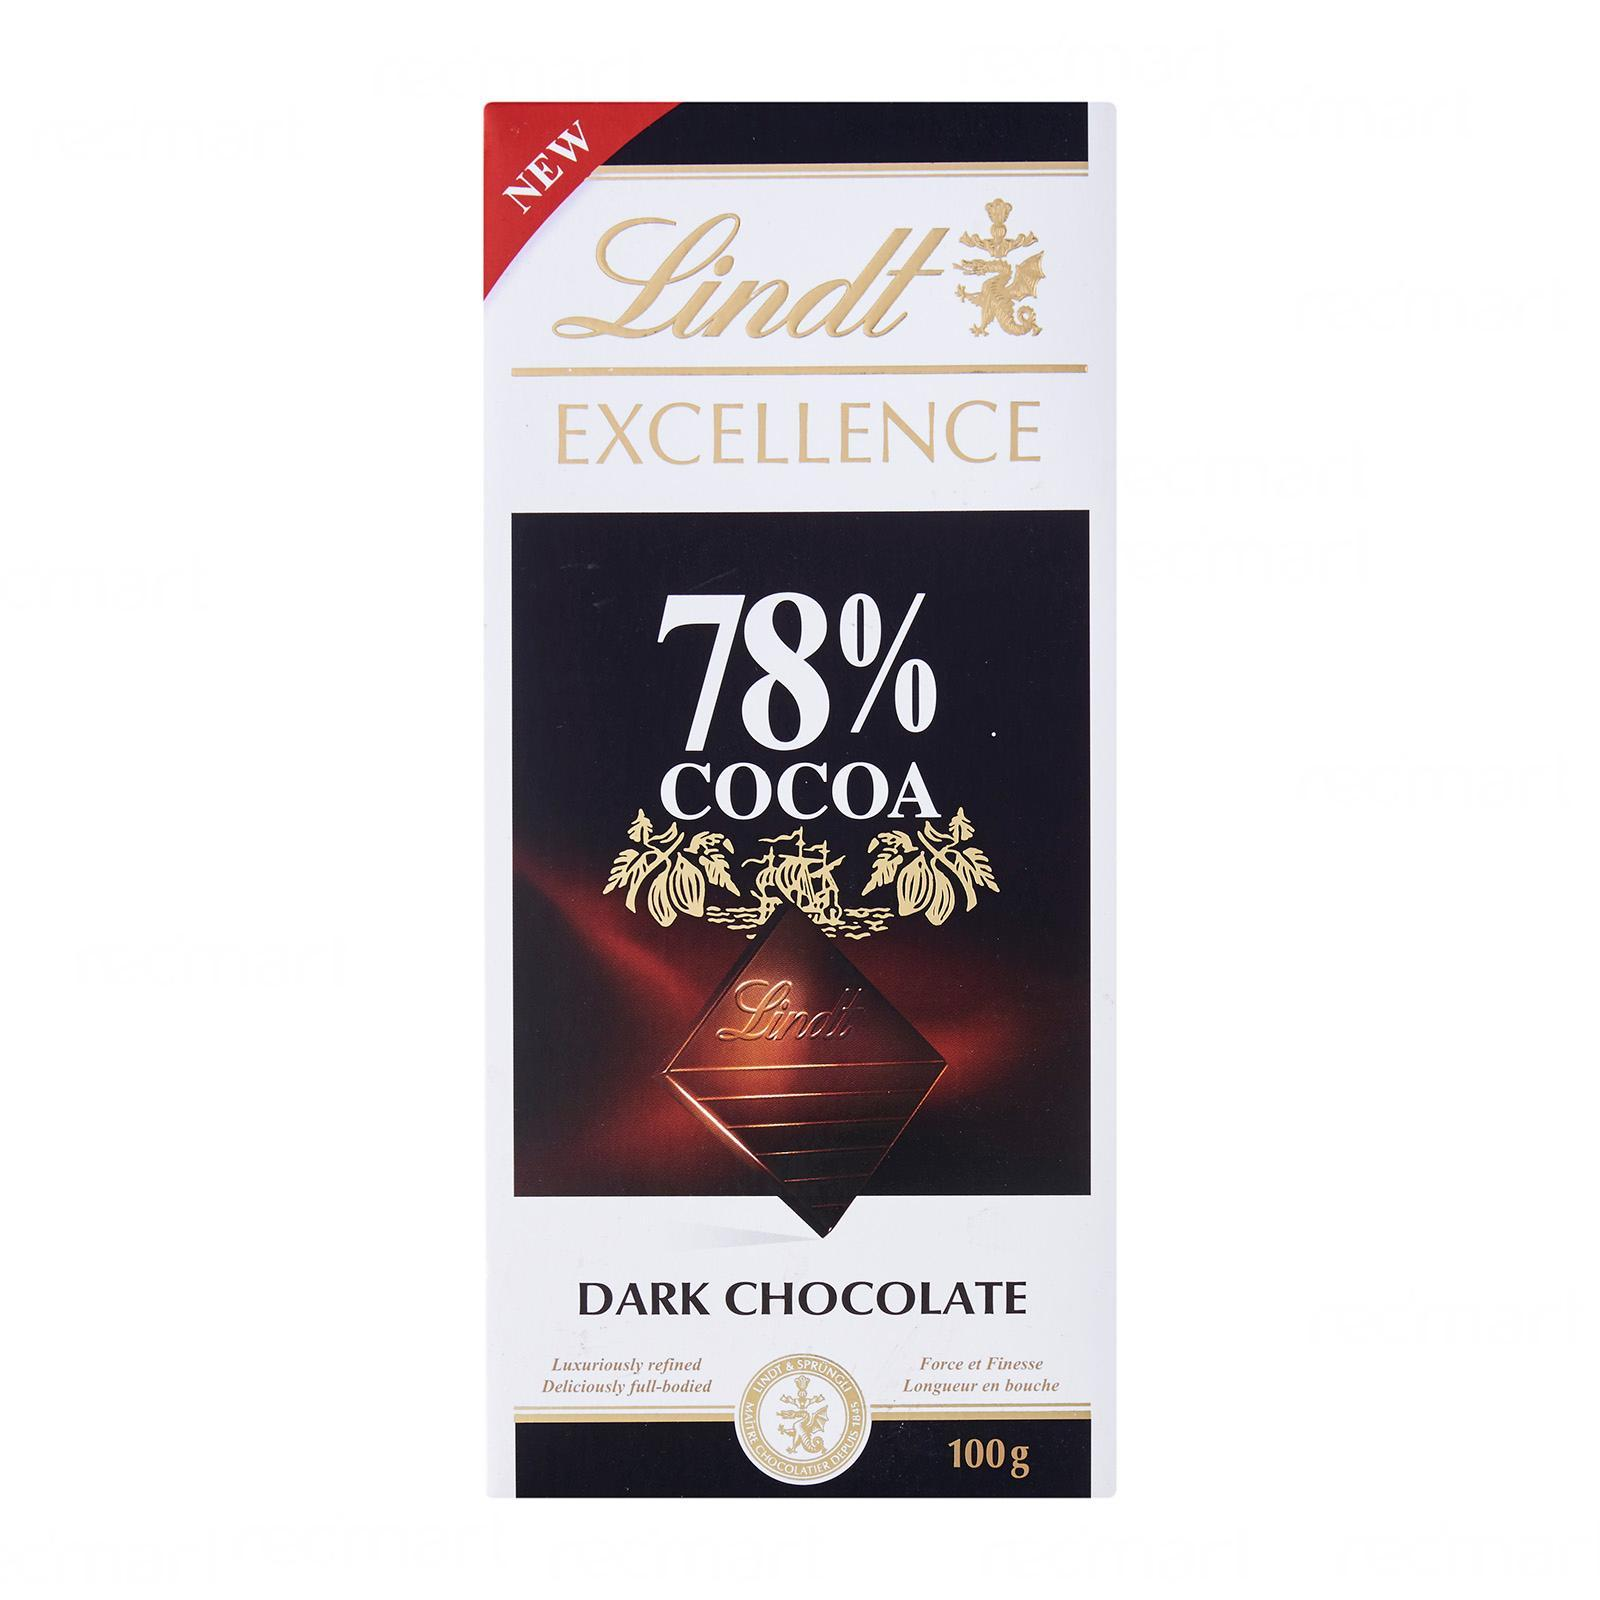 LINDT Excellence 78% Dark Chocolate 100g